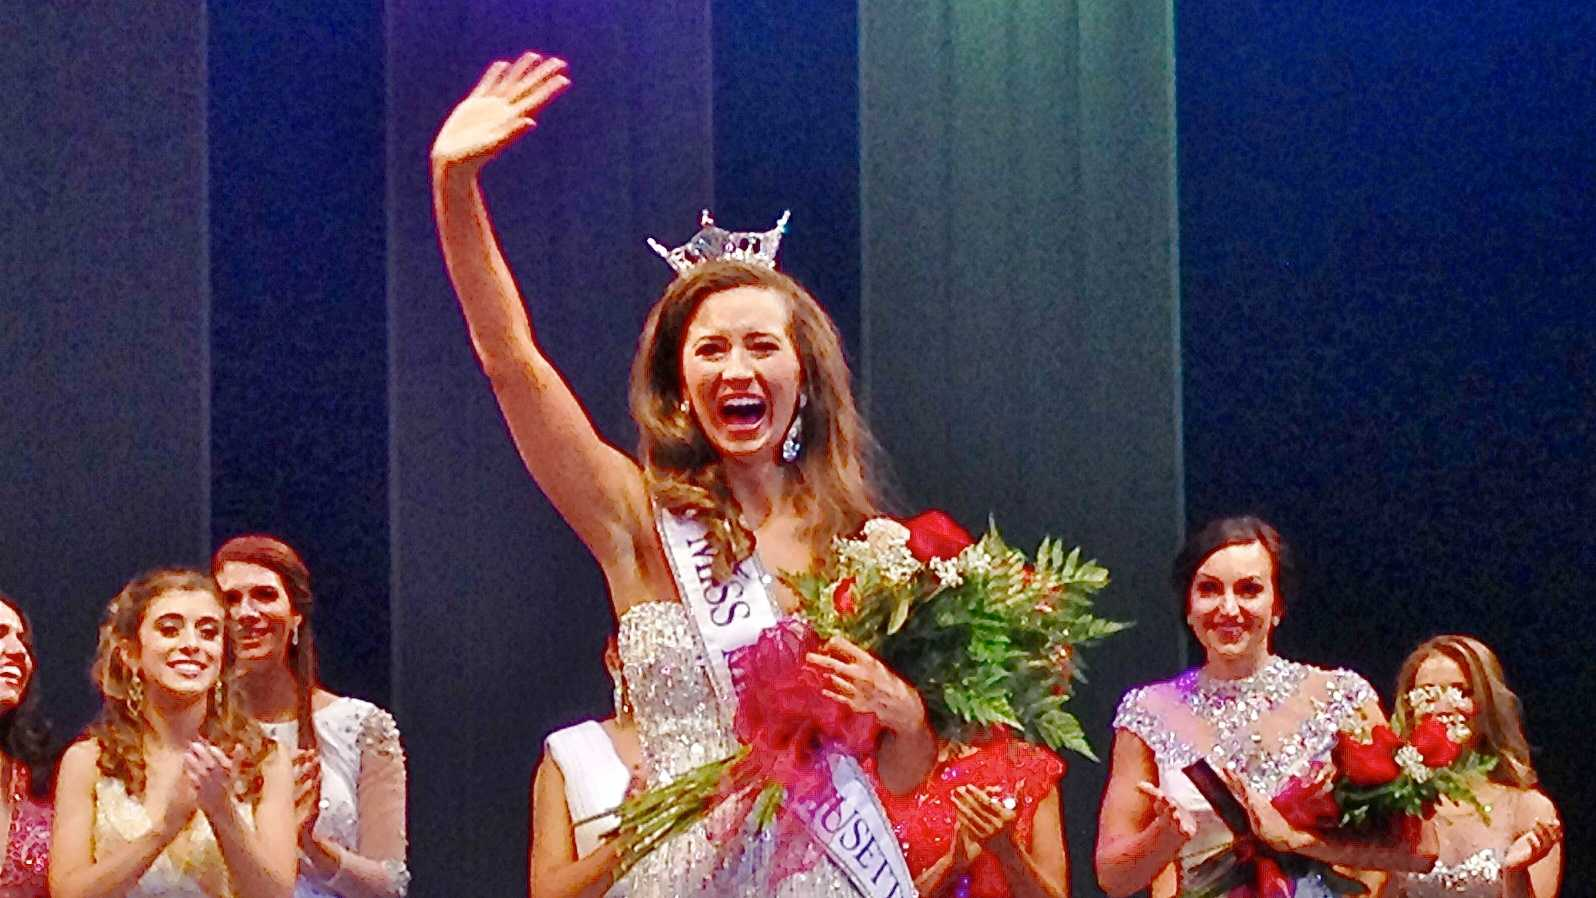 Miss. Massachusetts 2014